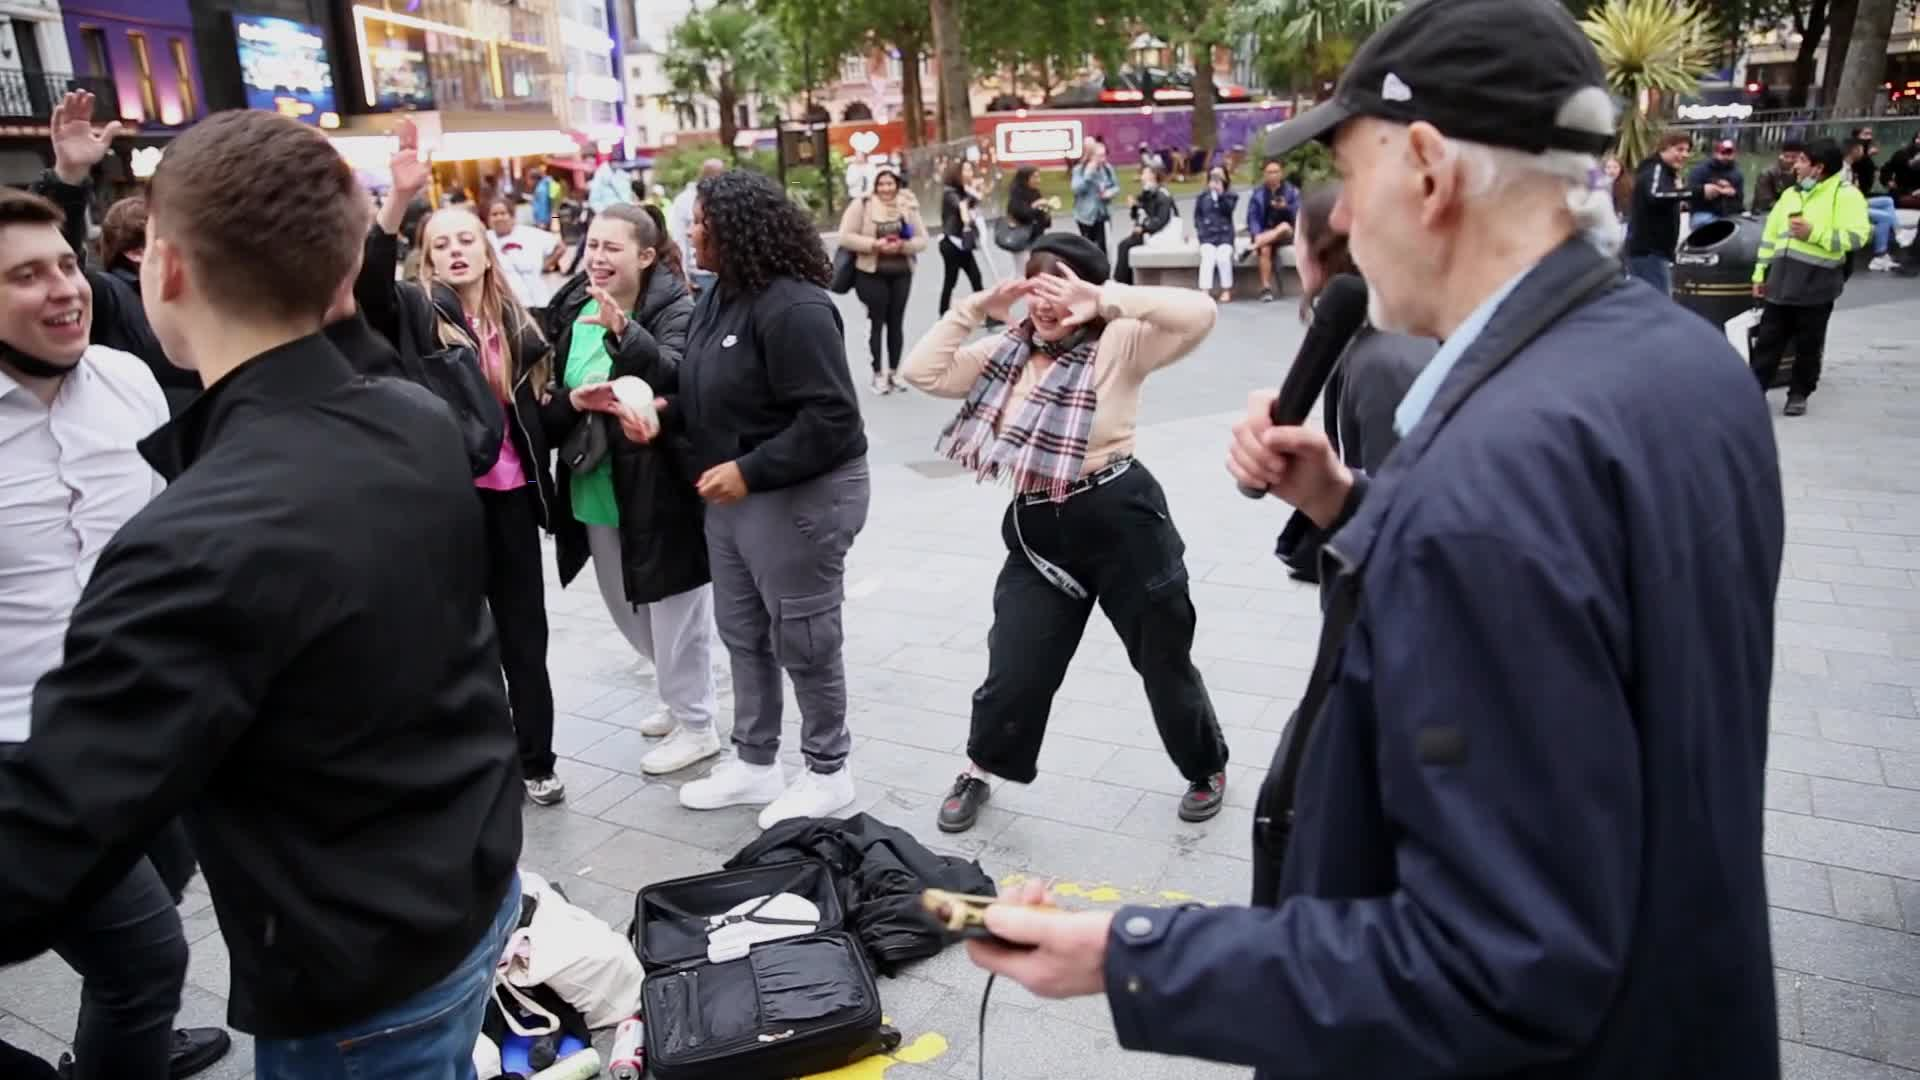 London enjoys street party despite lockdown